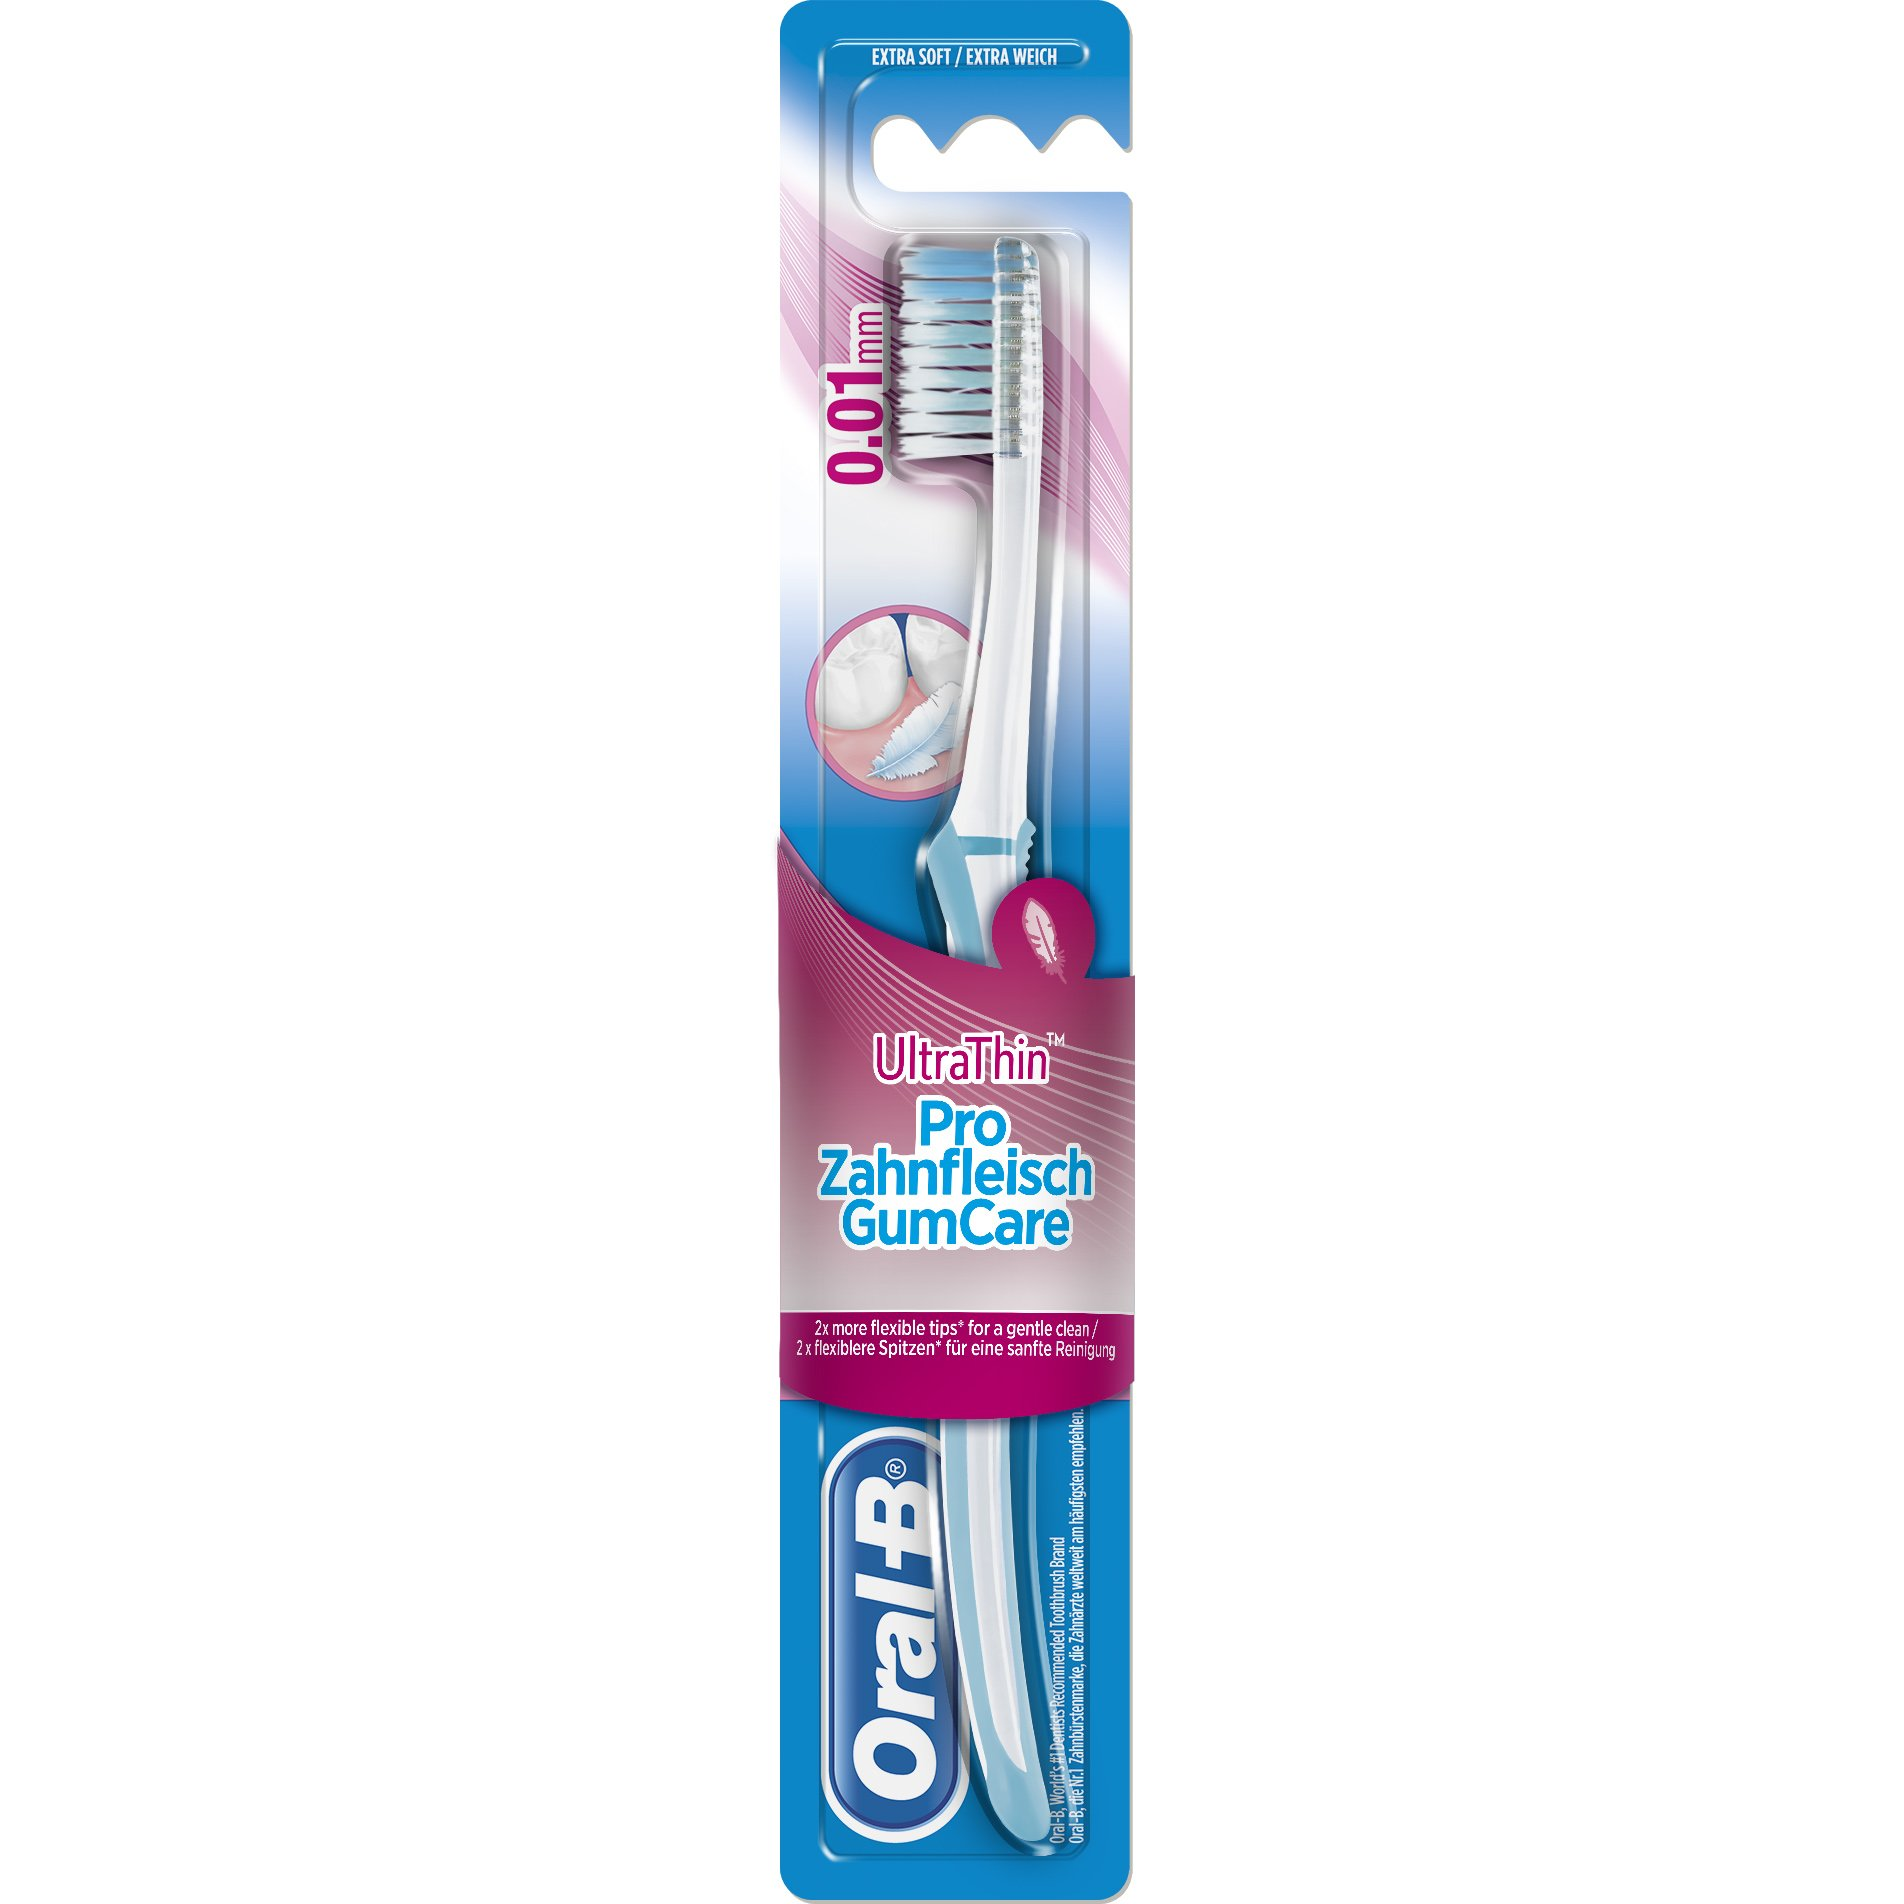 Oral B UltraThin Pro GumCare 0.01mm Extra Soft Πολύ Μαλακή Οδοντόβουρτσα με 2x πιο Εύκαμπτες Άκρες για Έναν Απαλό Καθαρισμό 1τμχ